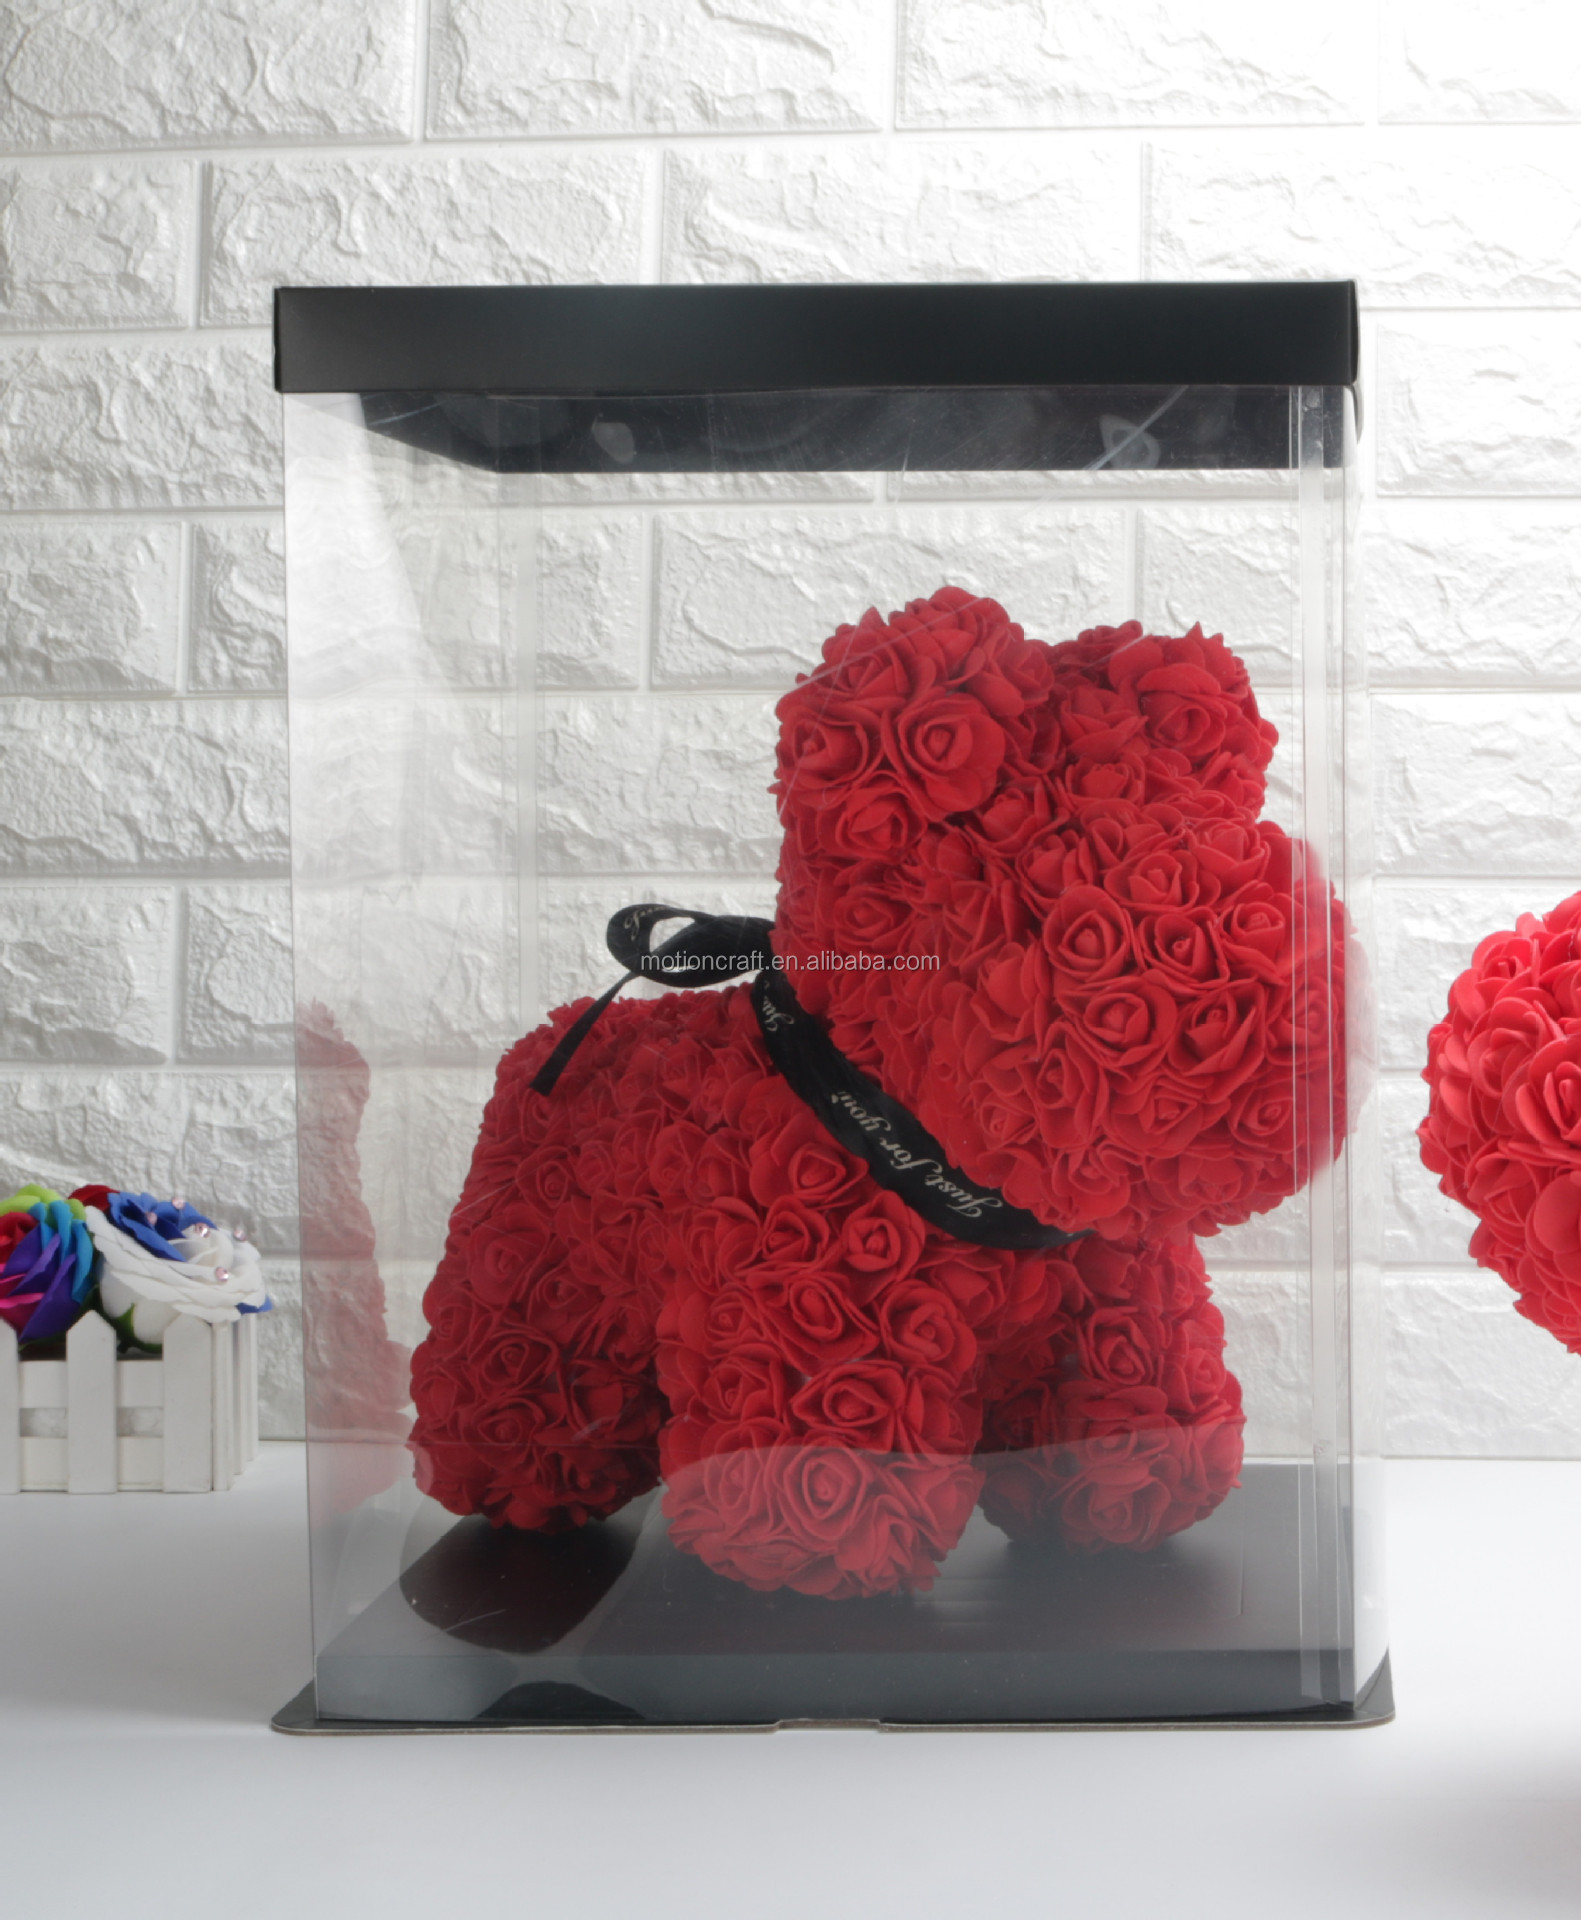 Rose Box Bear Doll Box Plastic Gift Box Packing Super Clear Thicken Layer Transparent Flower Box Birthday Cake Box(Black /& Transparent